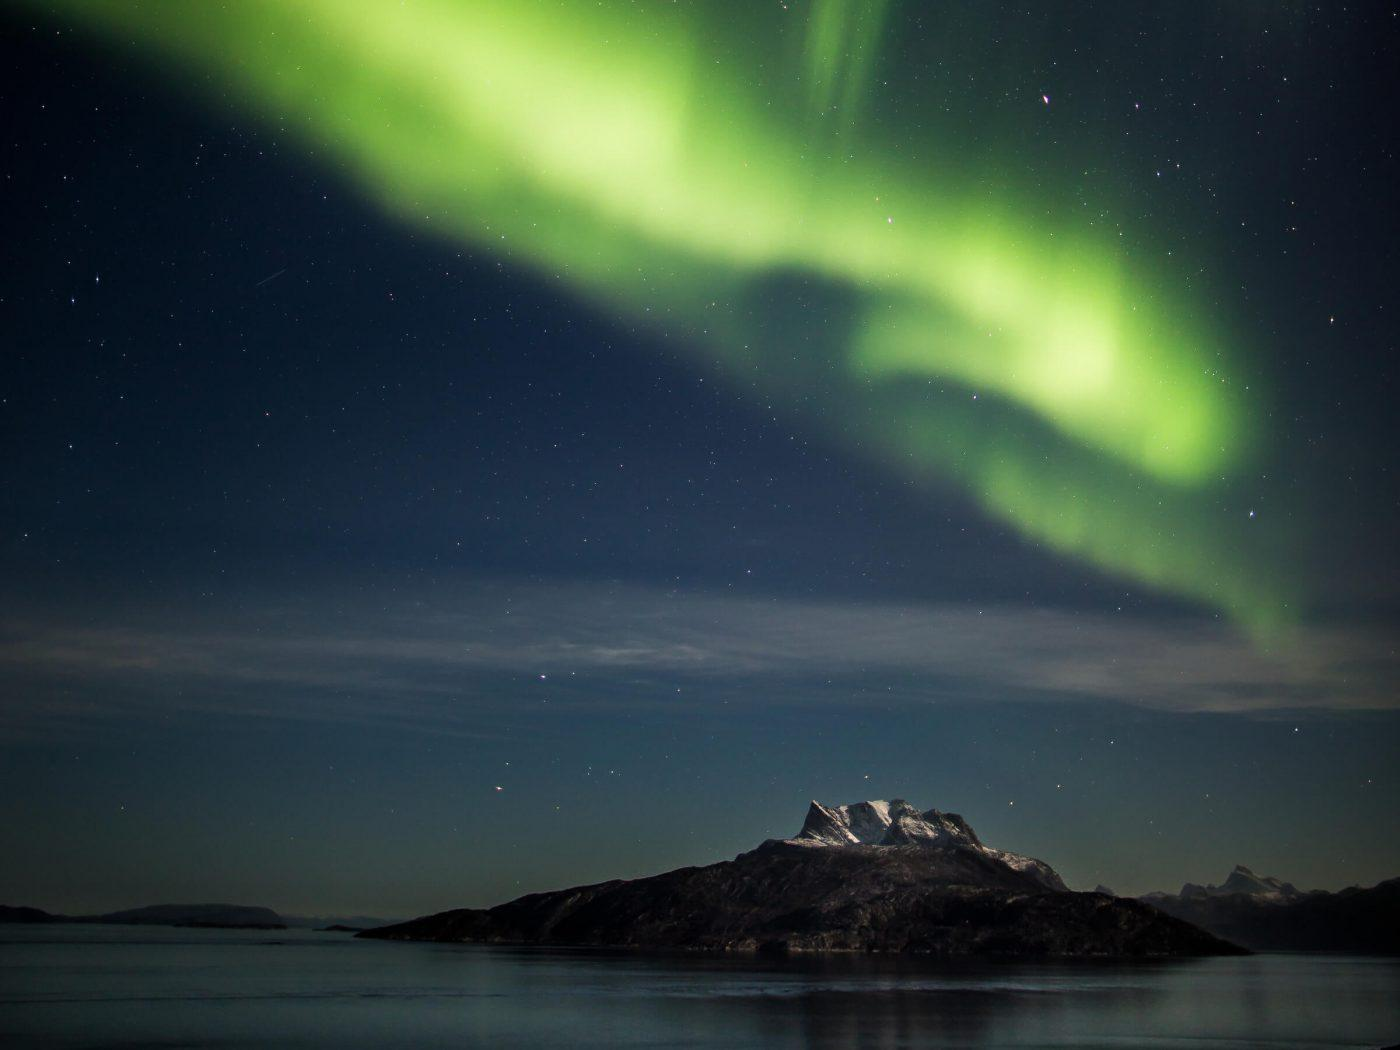 Northern light over Sermitsiaq mountain, Nuuk, by Mads Pihl